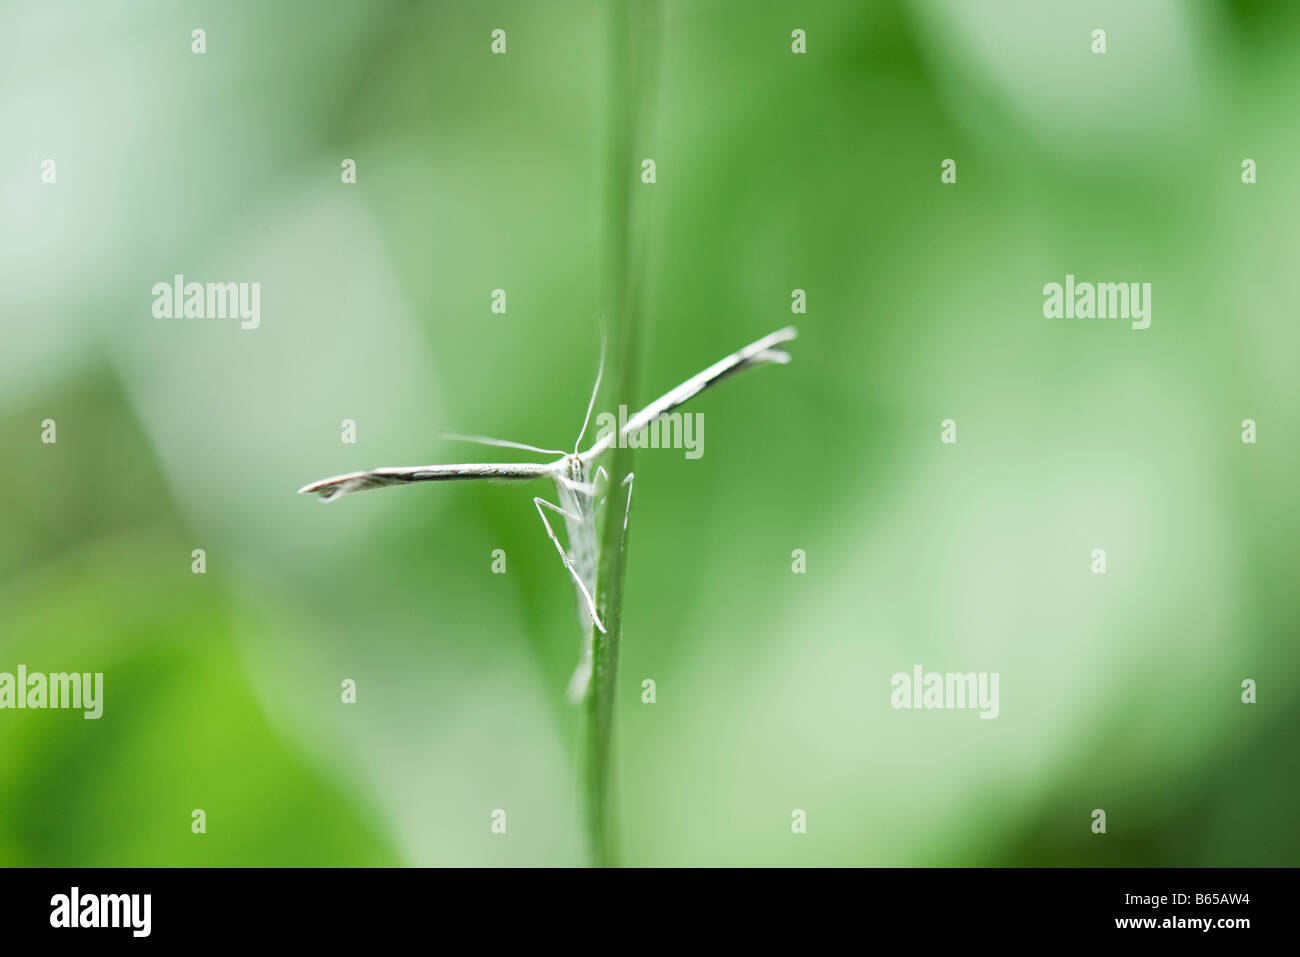 Plume moth (stenoptilia pterodactyla) perched on stem of plant - Stock Image